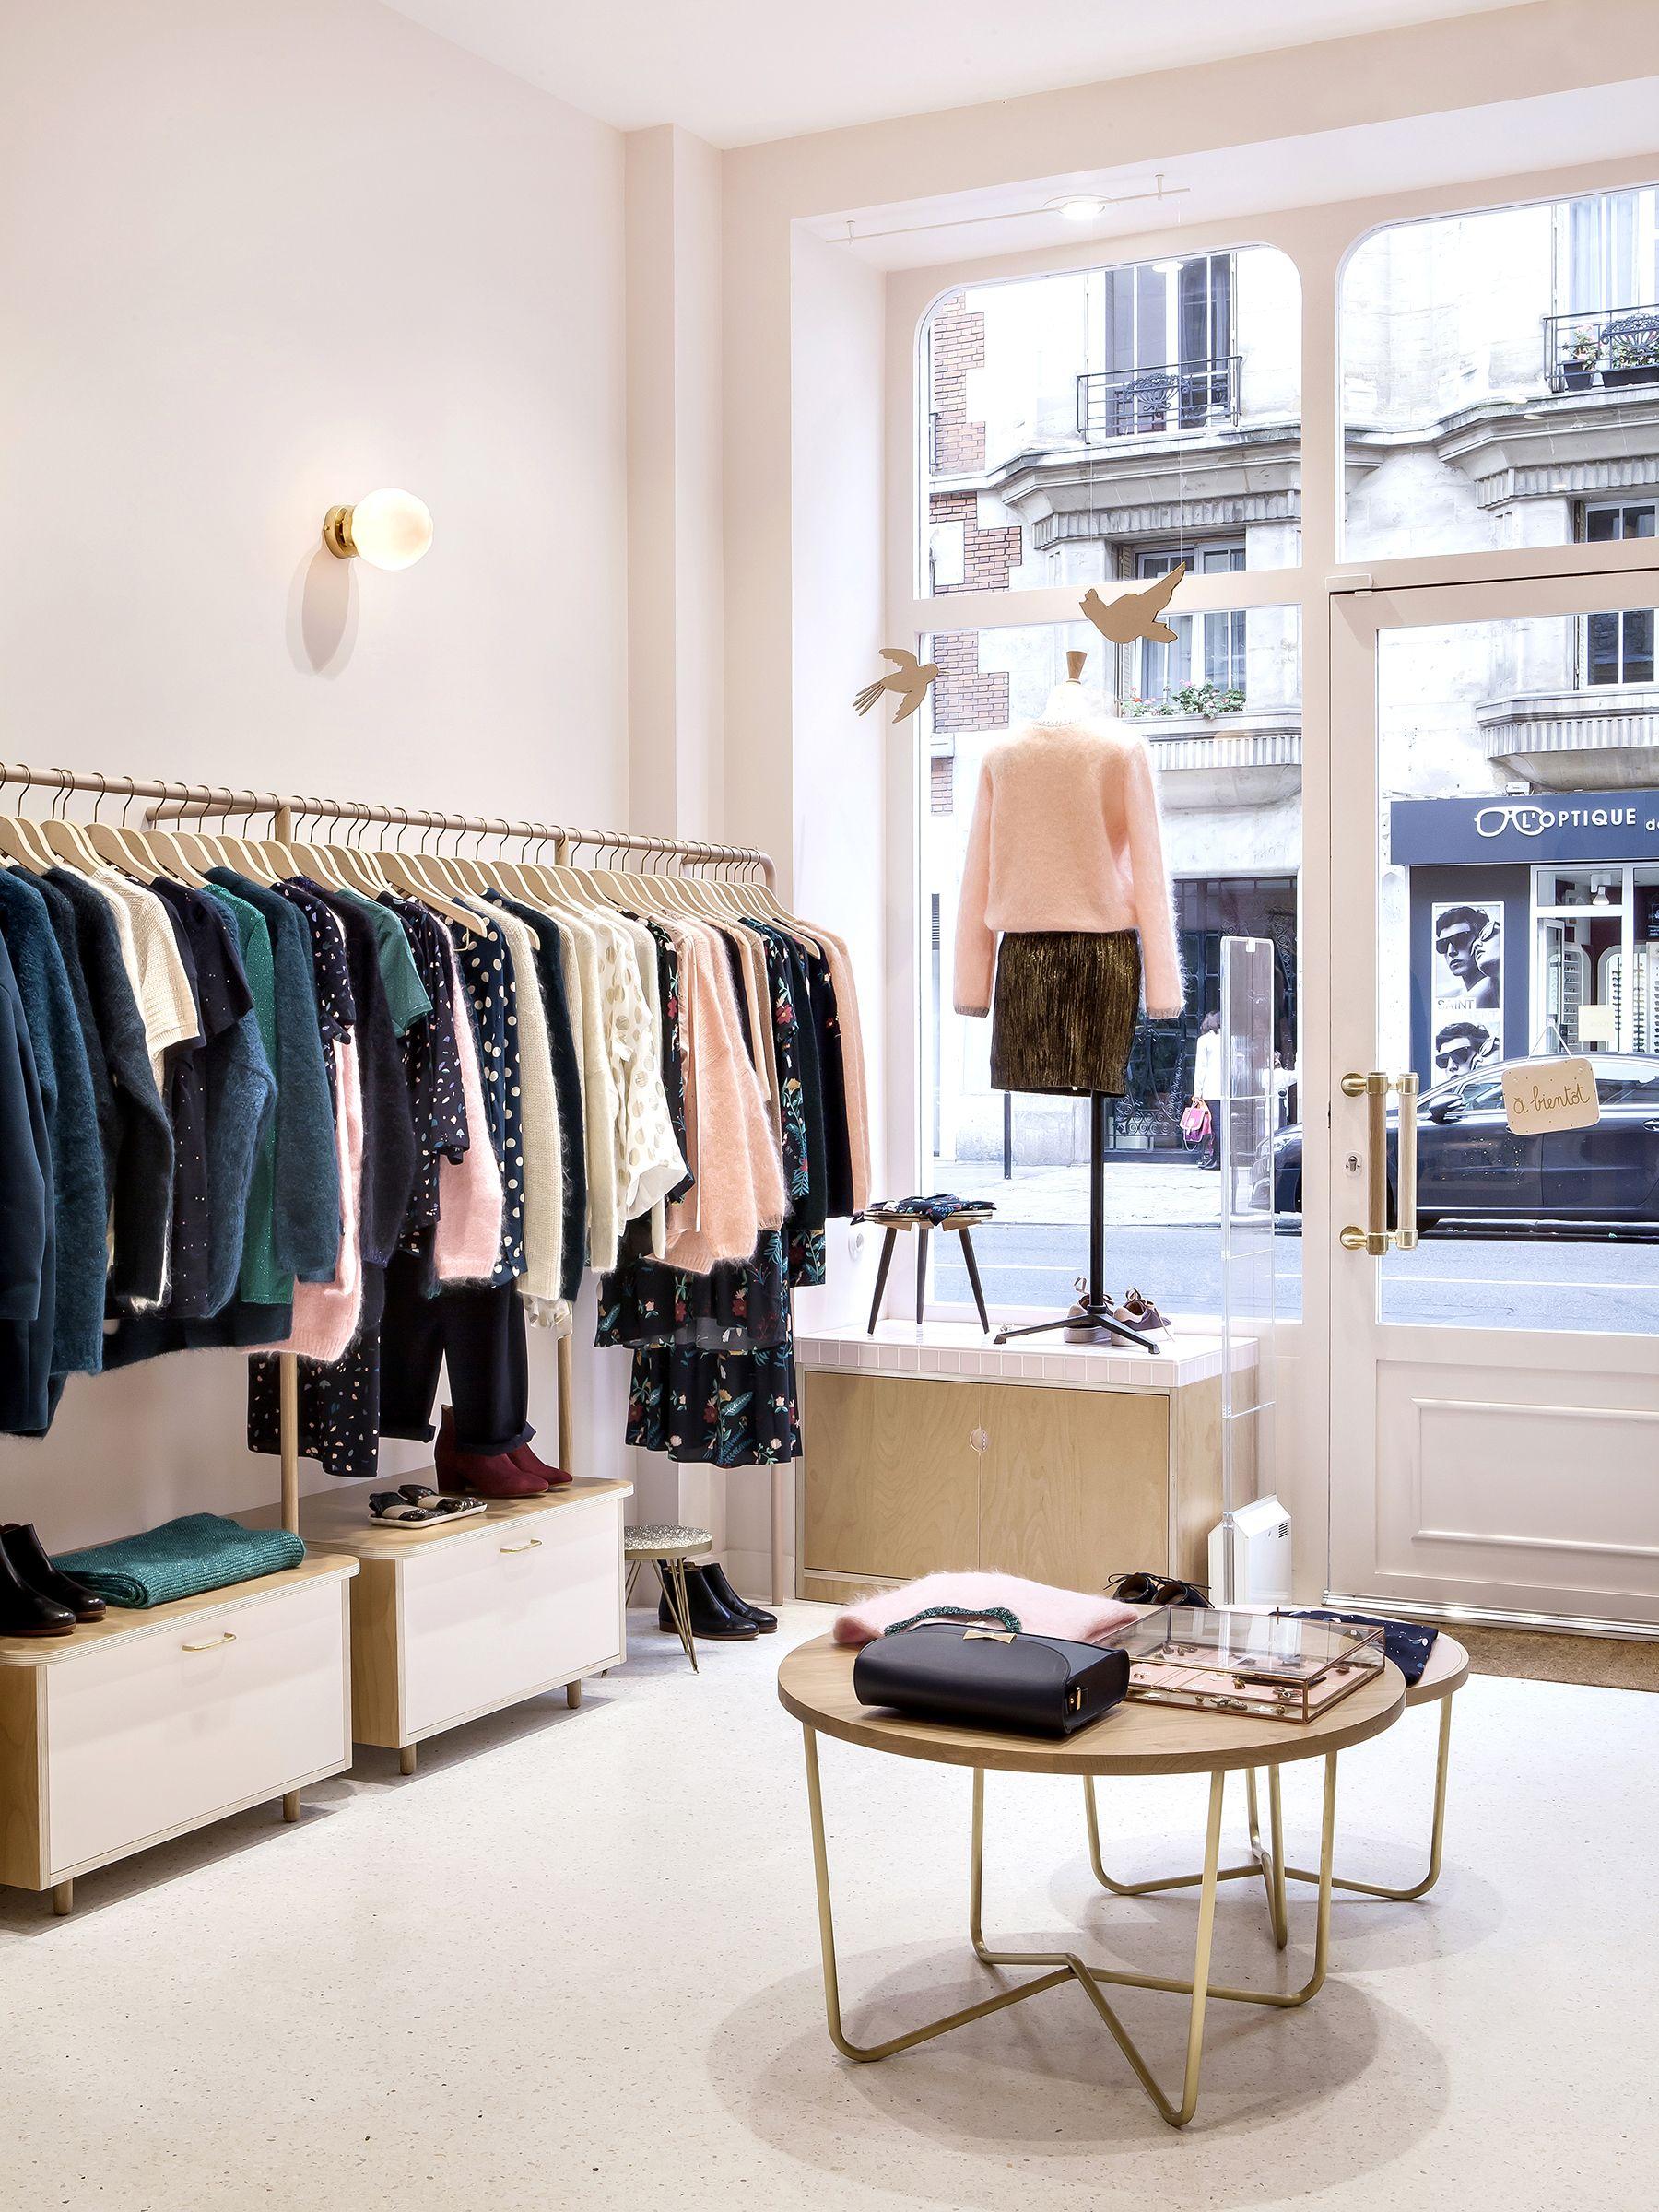 Renovation Boutique Des Petits Hauts A Paris Heju Studio